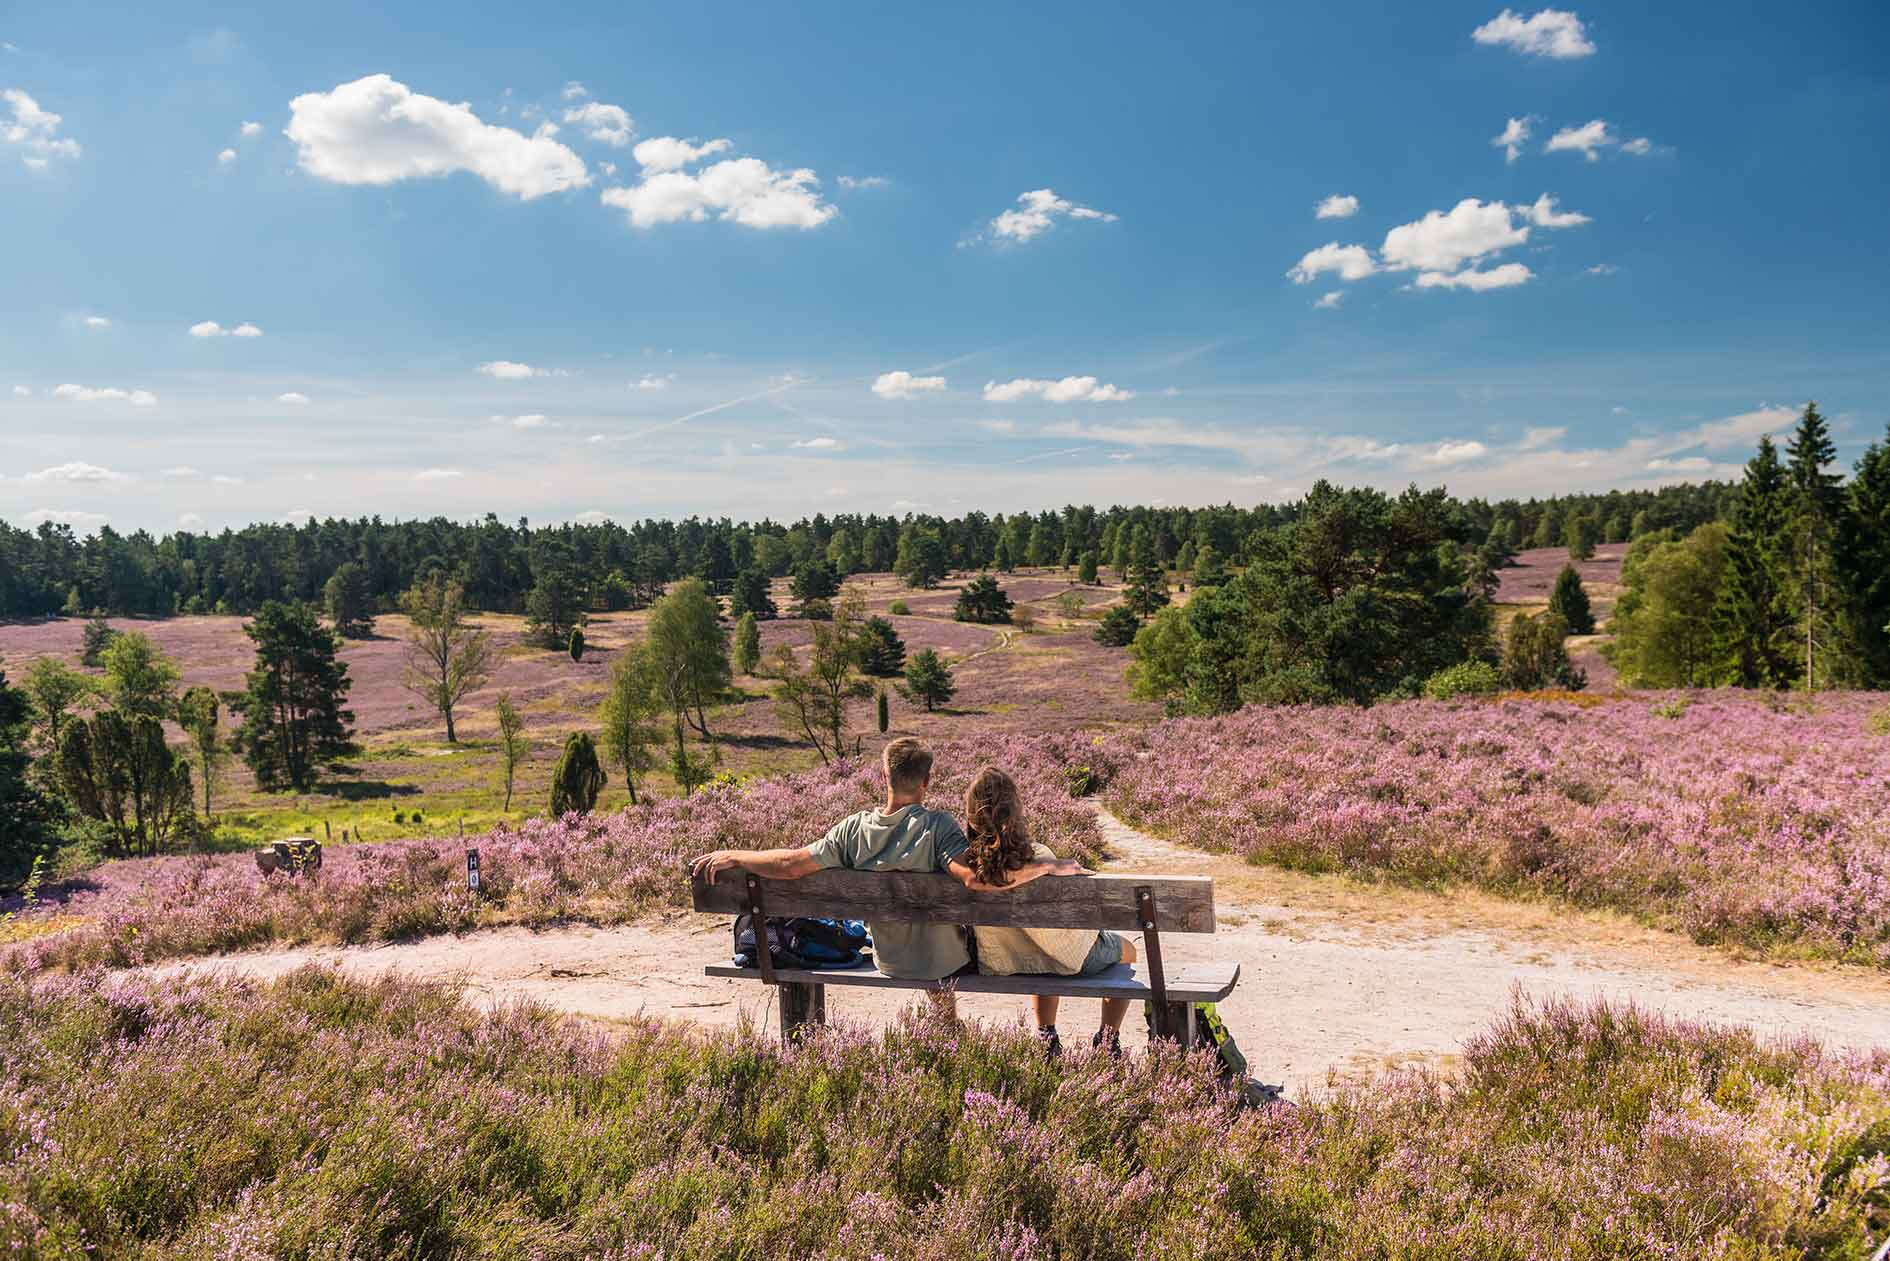 Paar auf Bank in Lüneburger Heide